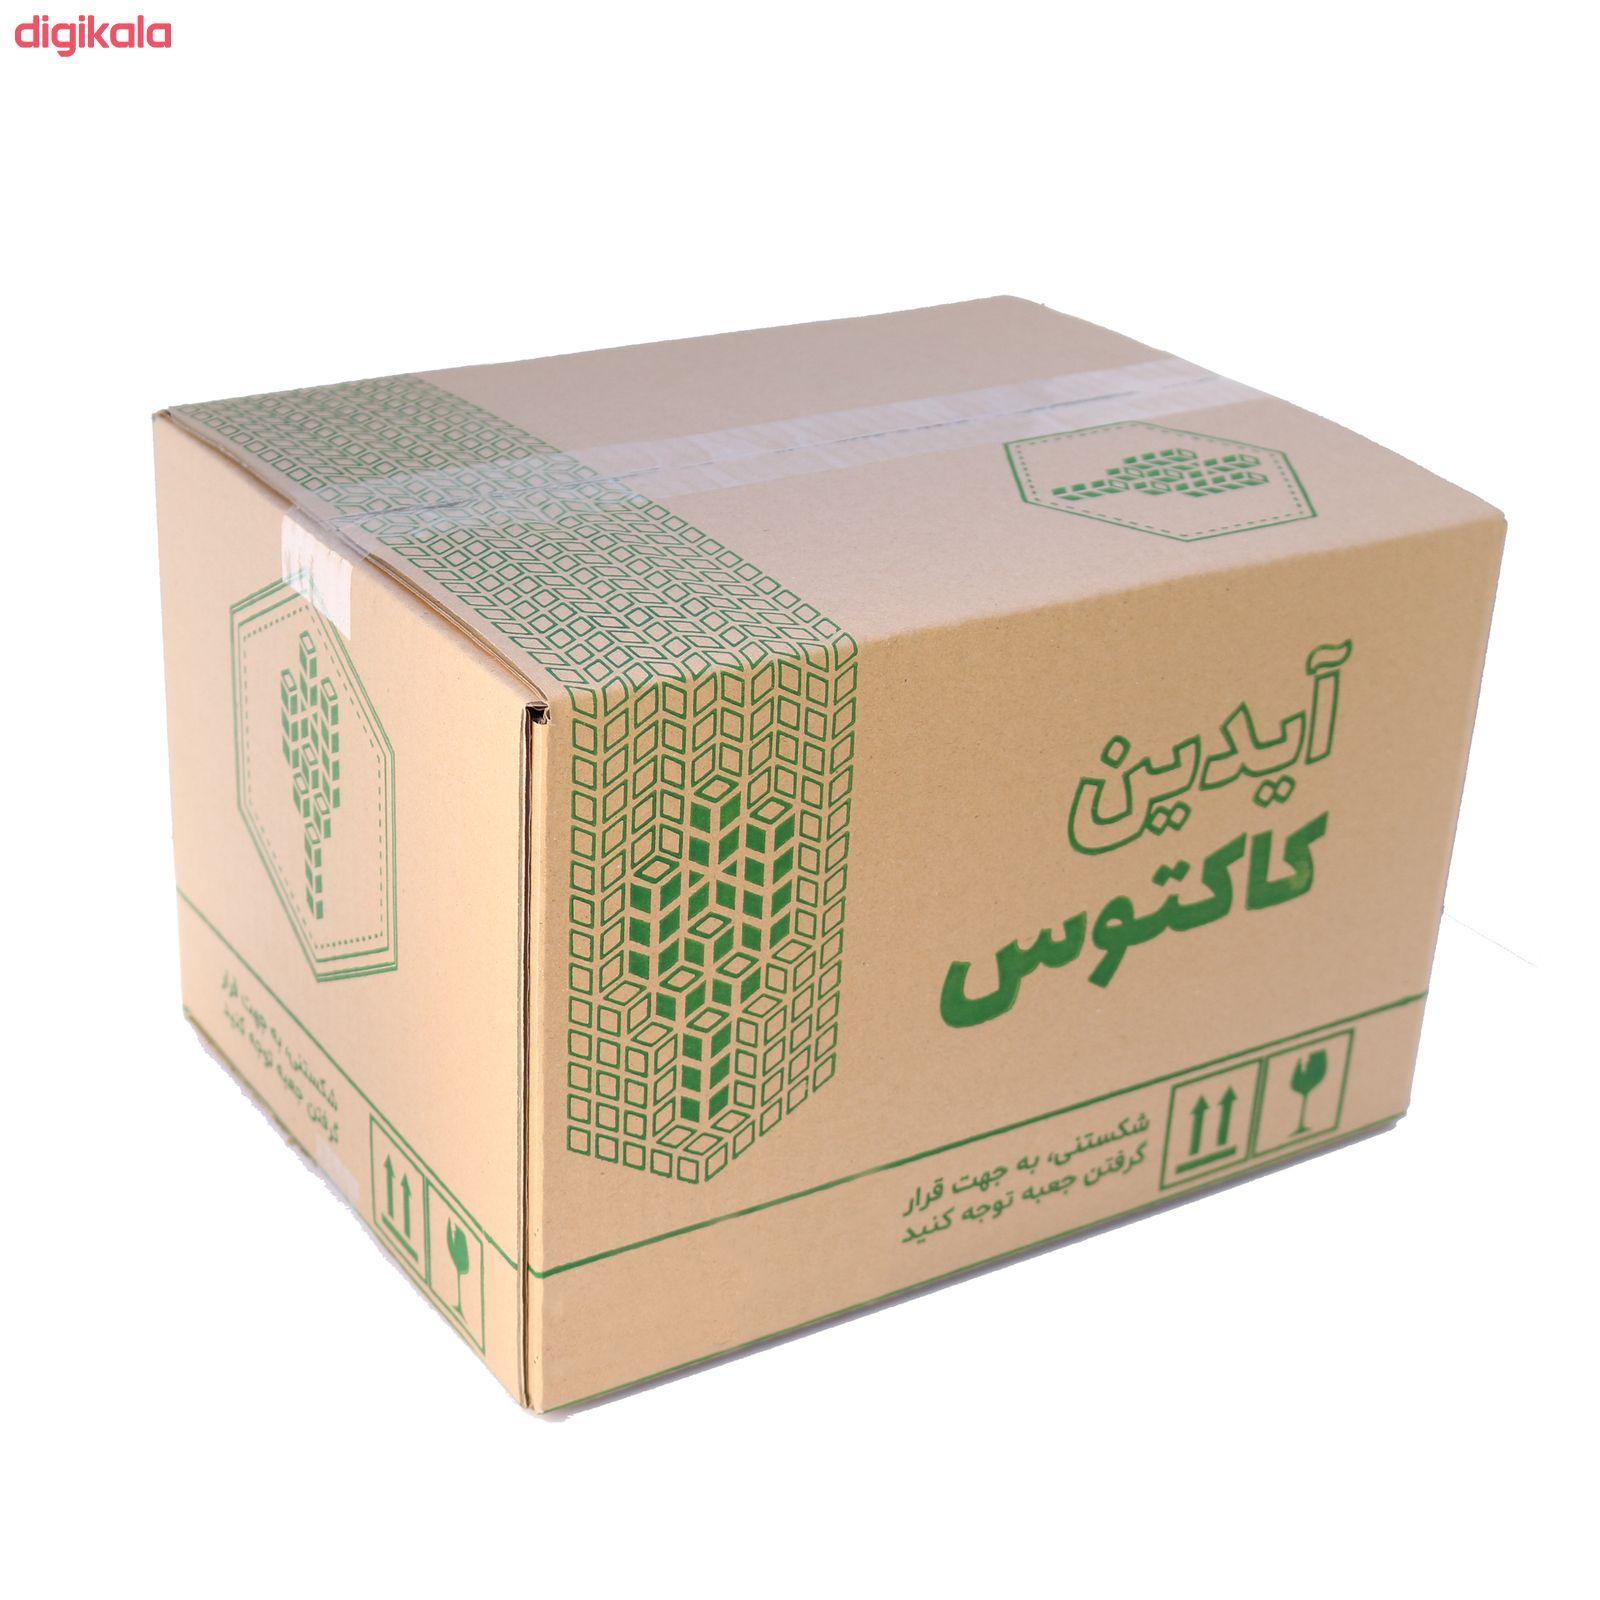 گیاه طبیعی کاکتوس و ساکولنت آیدین کاکتوس کد CB-004 بسته 12 عددی main 1 7